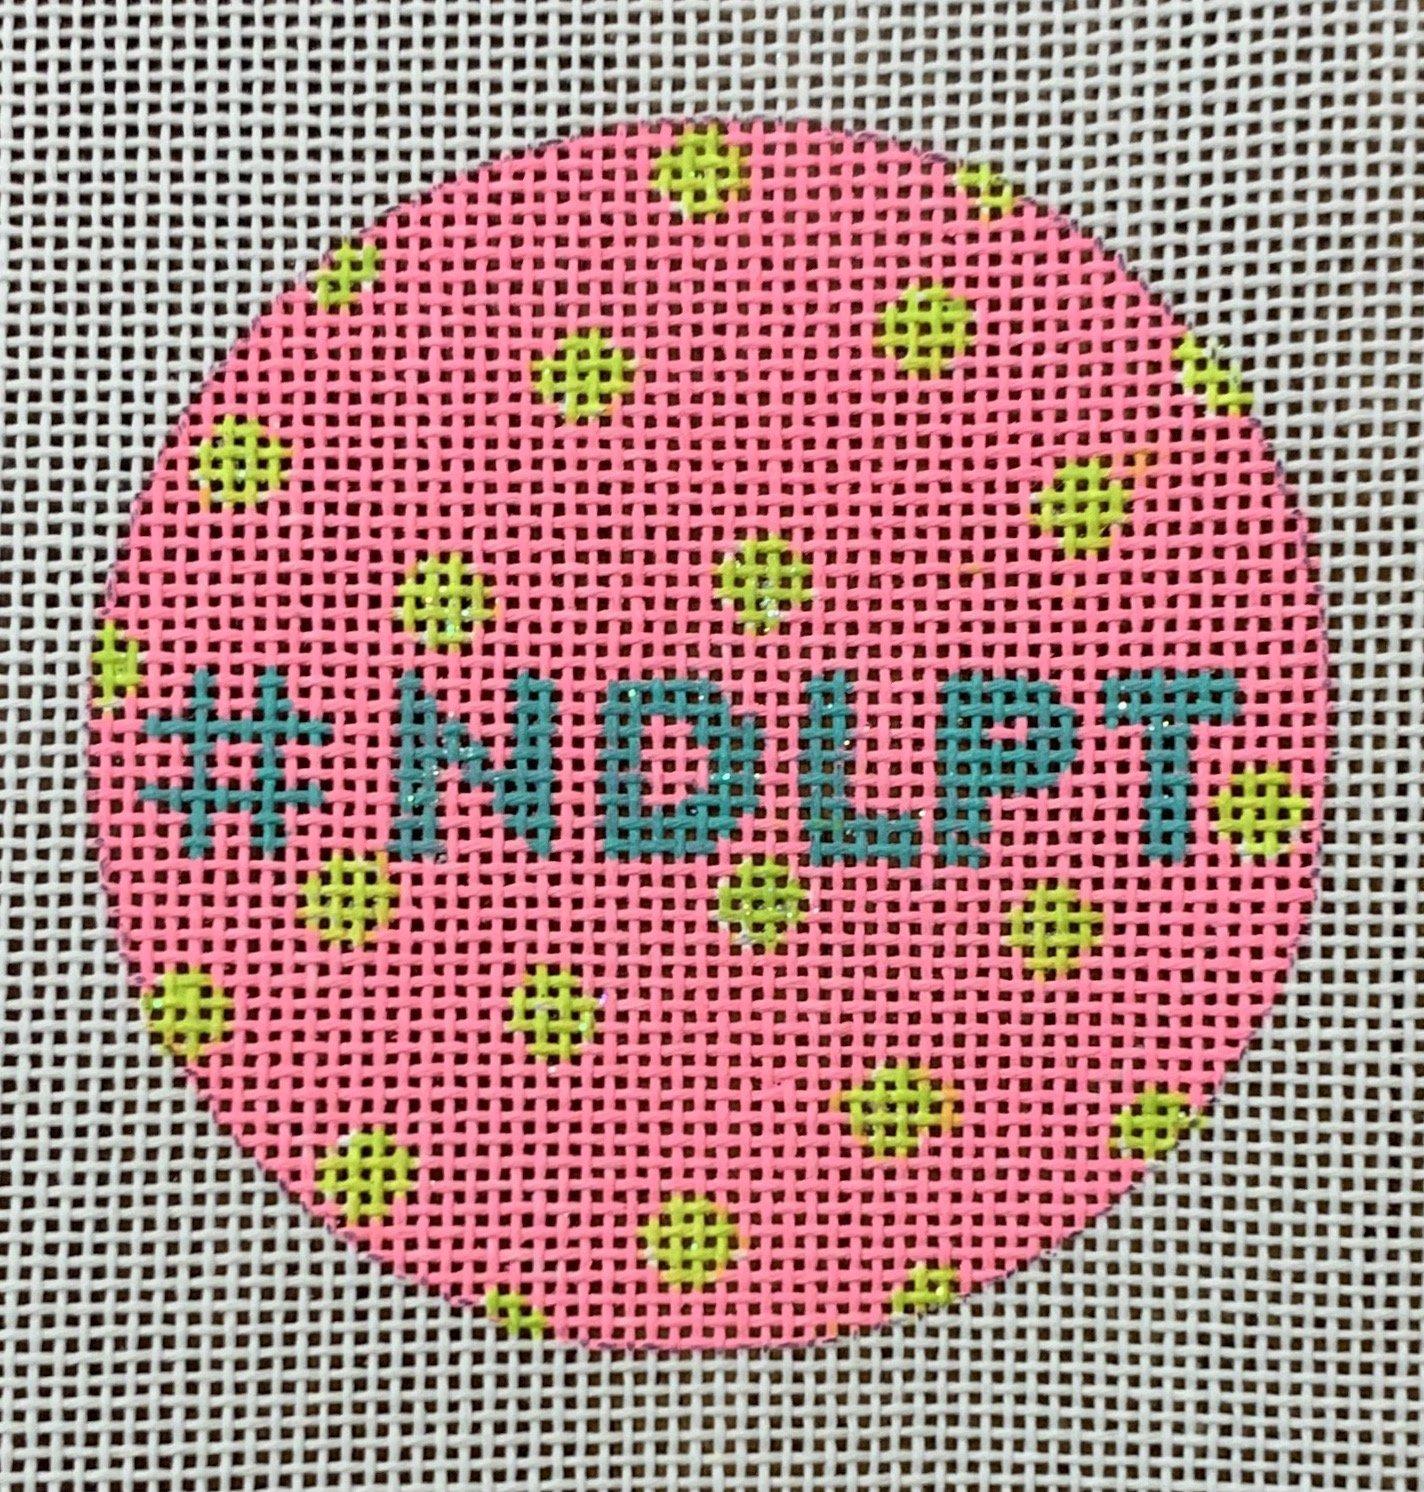 3 Round #NDLPT Hot Pink w/lime polka dots